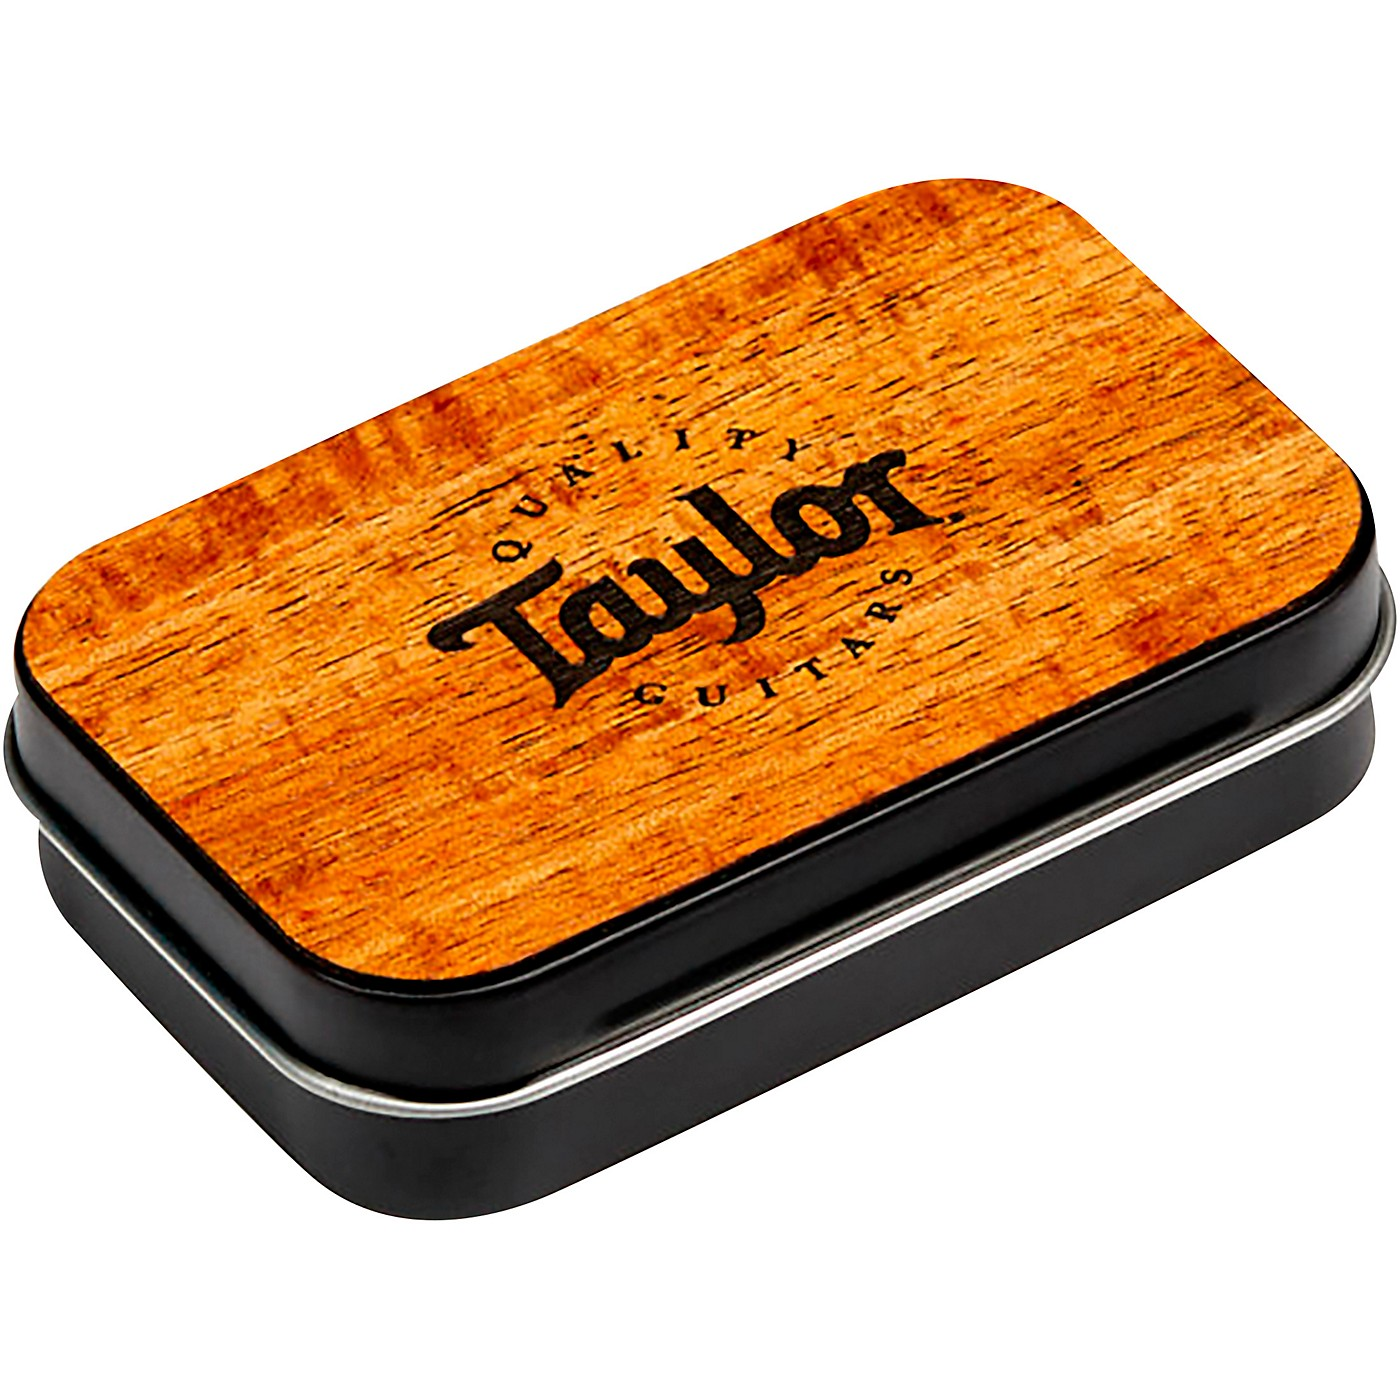 Taylor Darktone Series Collectors Edition Pick Tin thumbnail